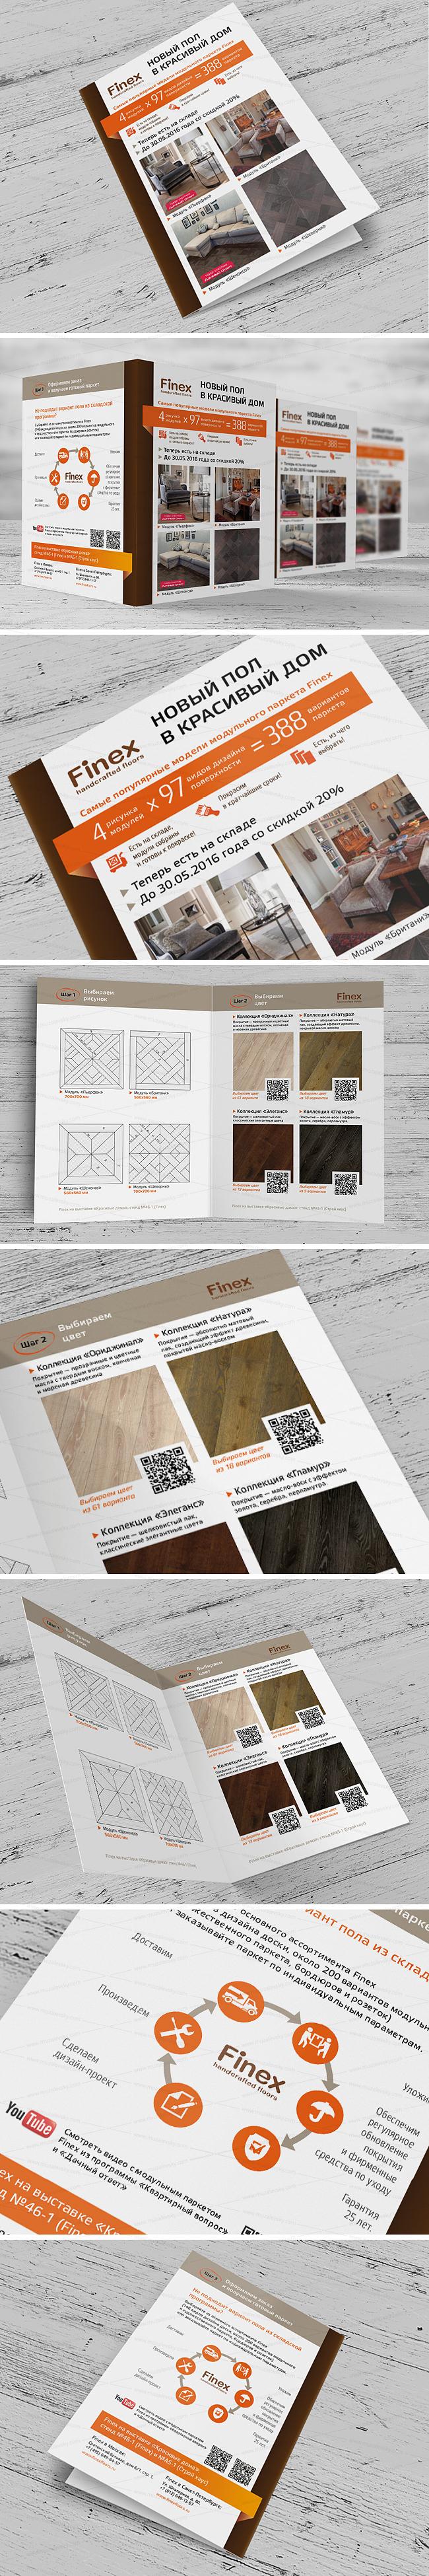 Booklet-Finex_dom-pol_my